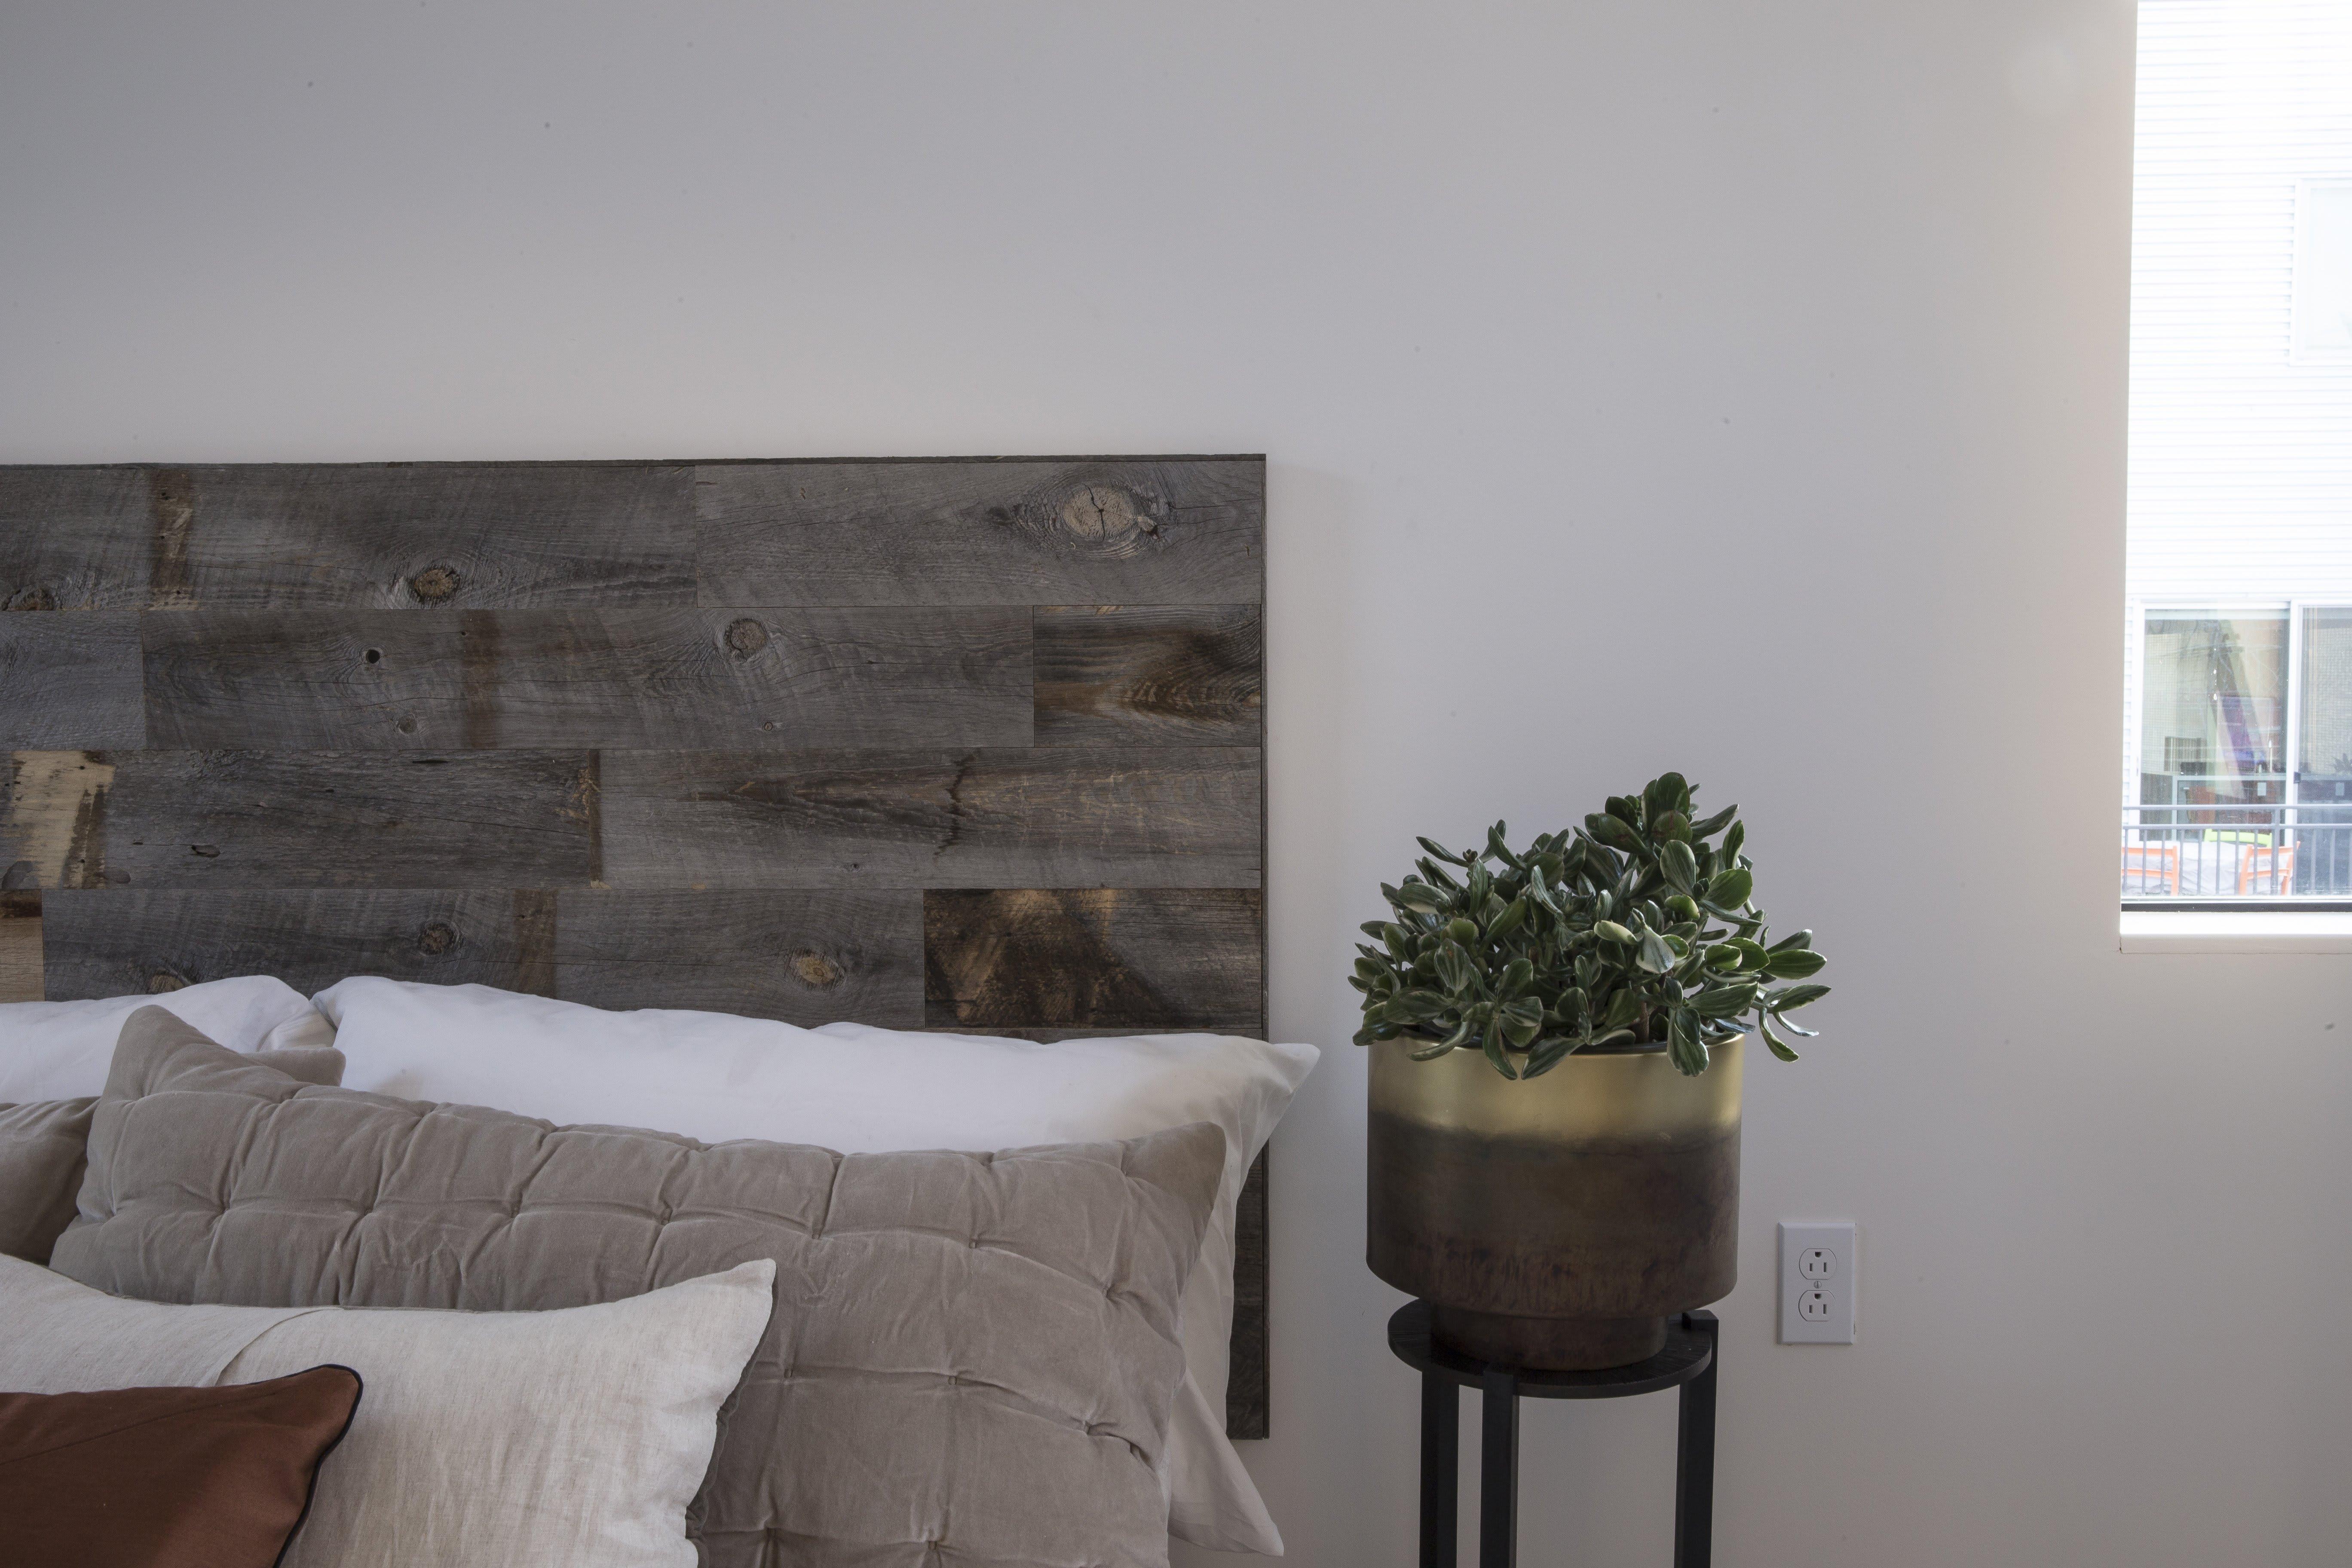 Reclaimed Weathered Wood Stikit Headboard peel and stick